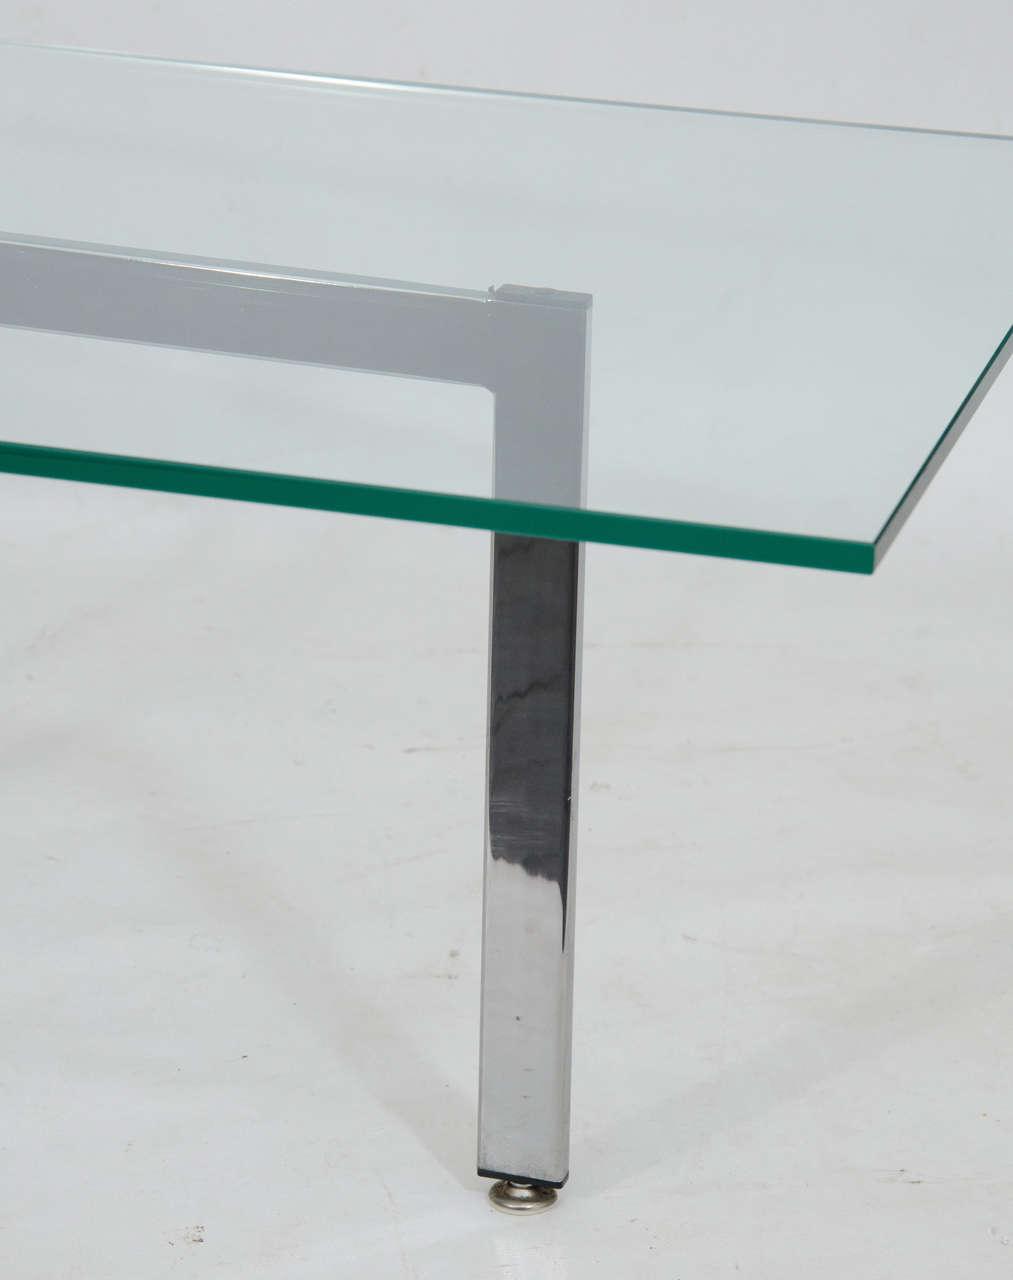 Rectangular Glass Coffee Table: Chrome And Glass Rectangular Coffee Table At 1stdibs